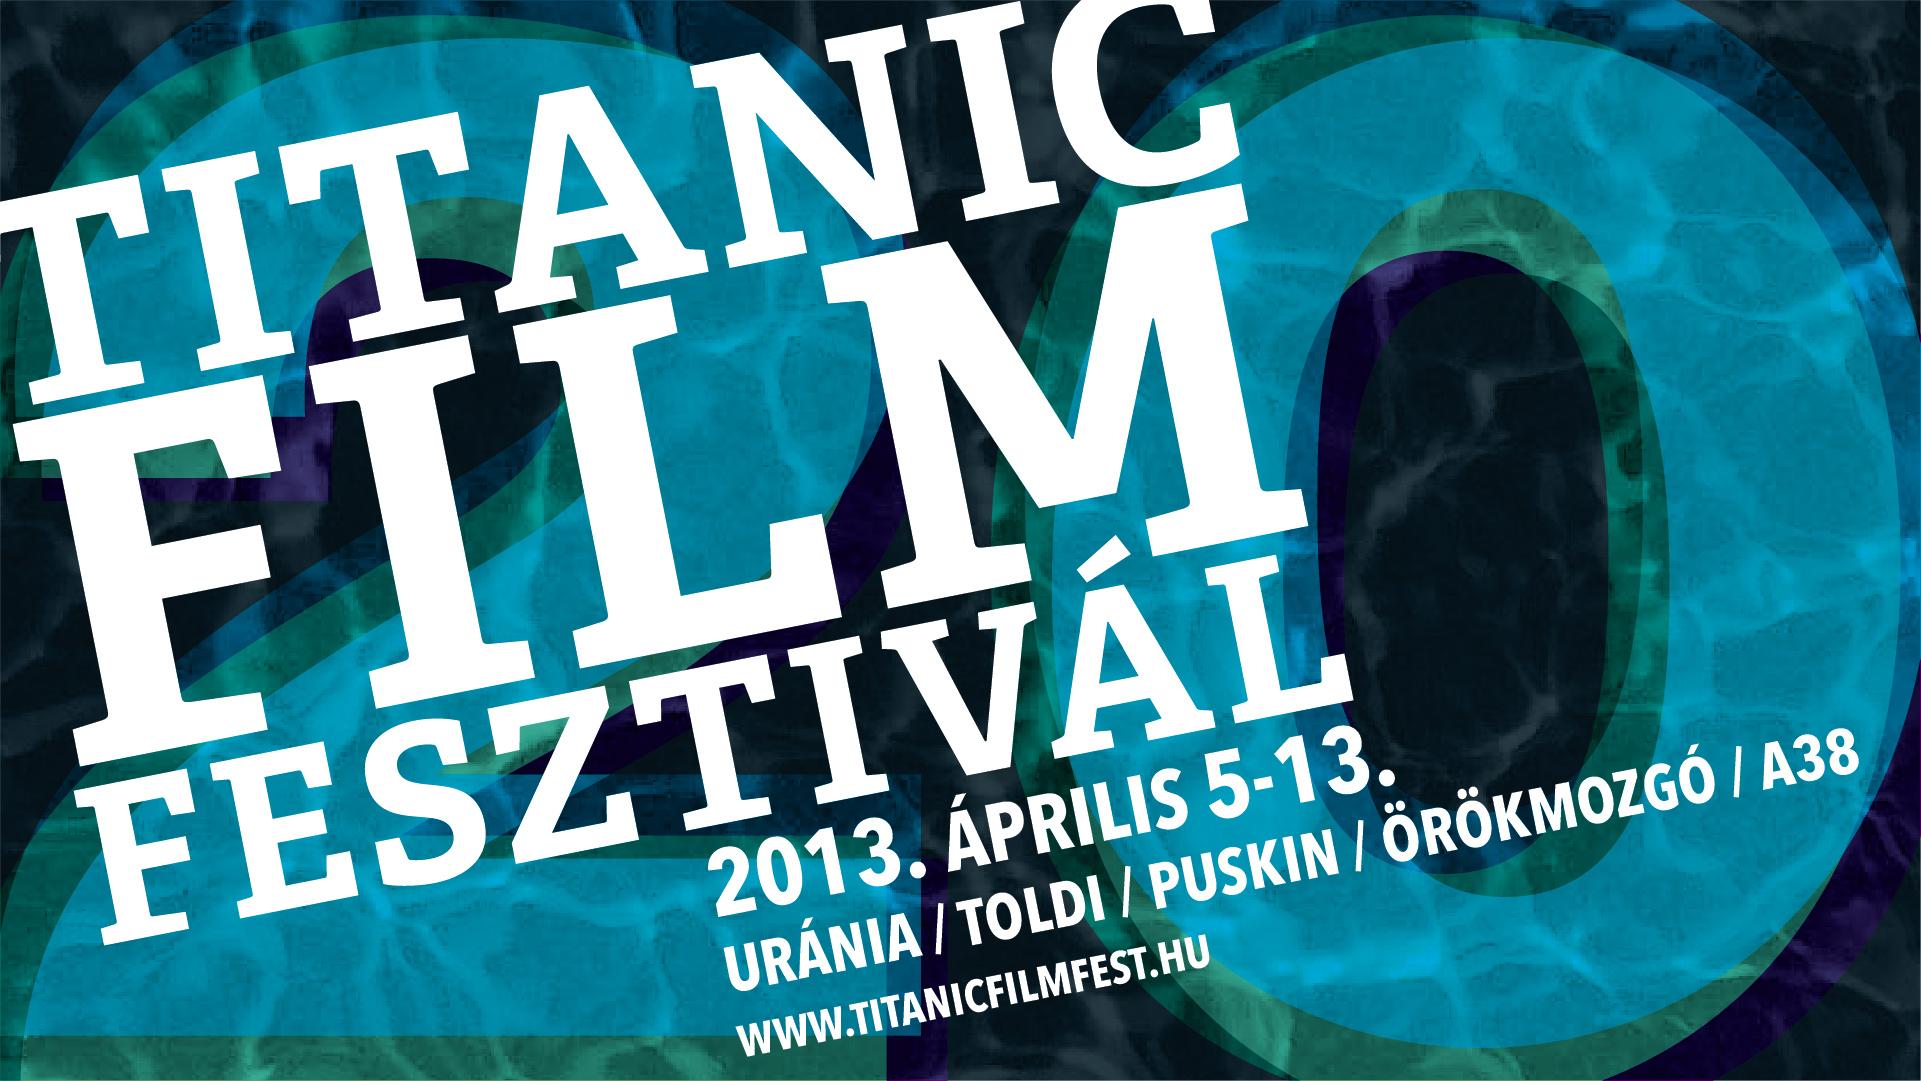 titanic20.jpg